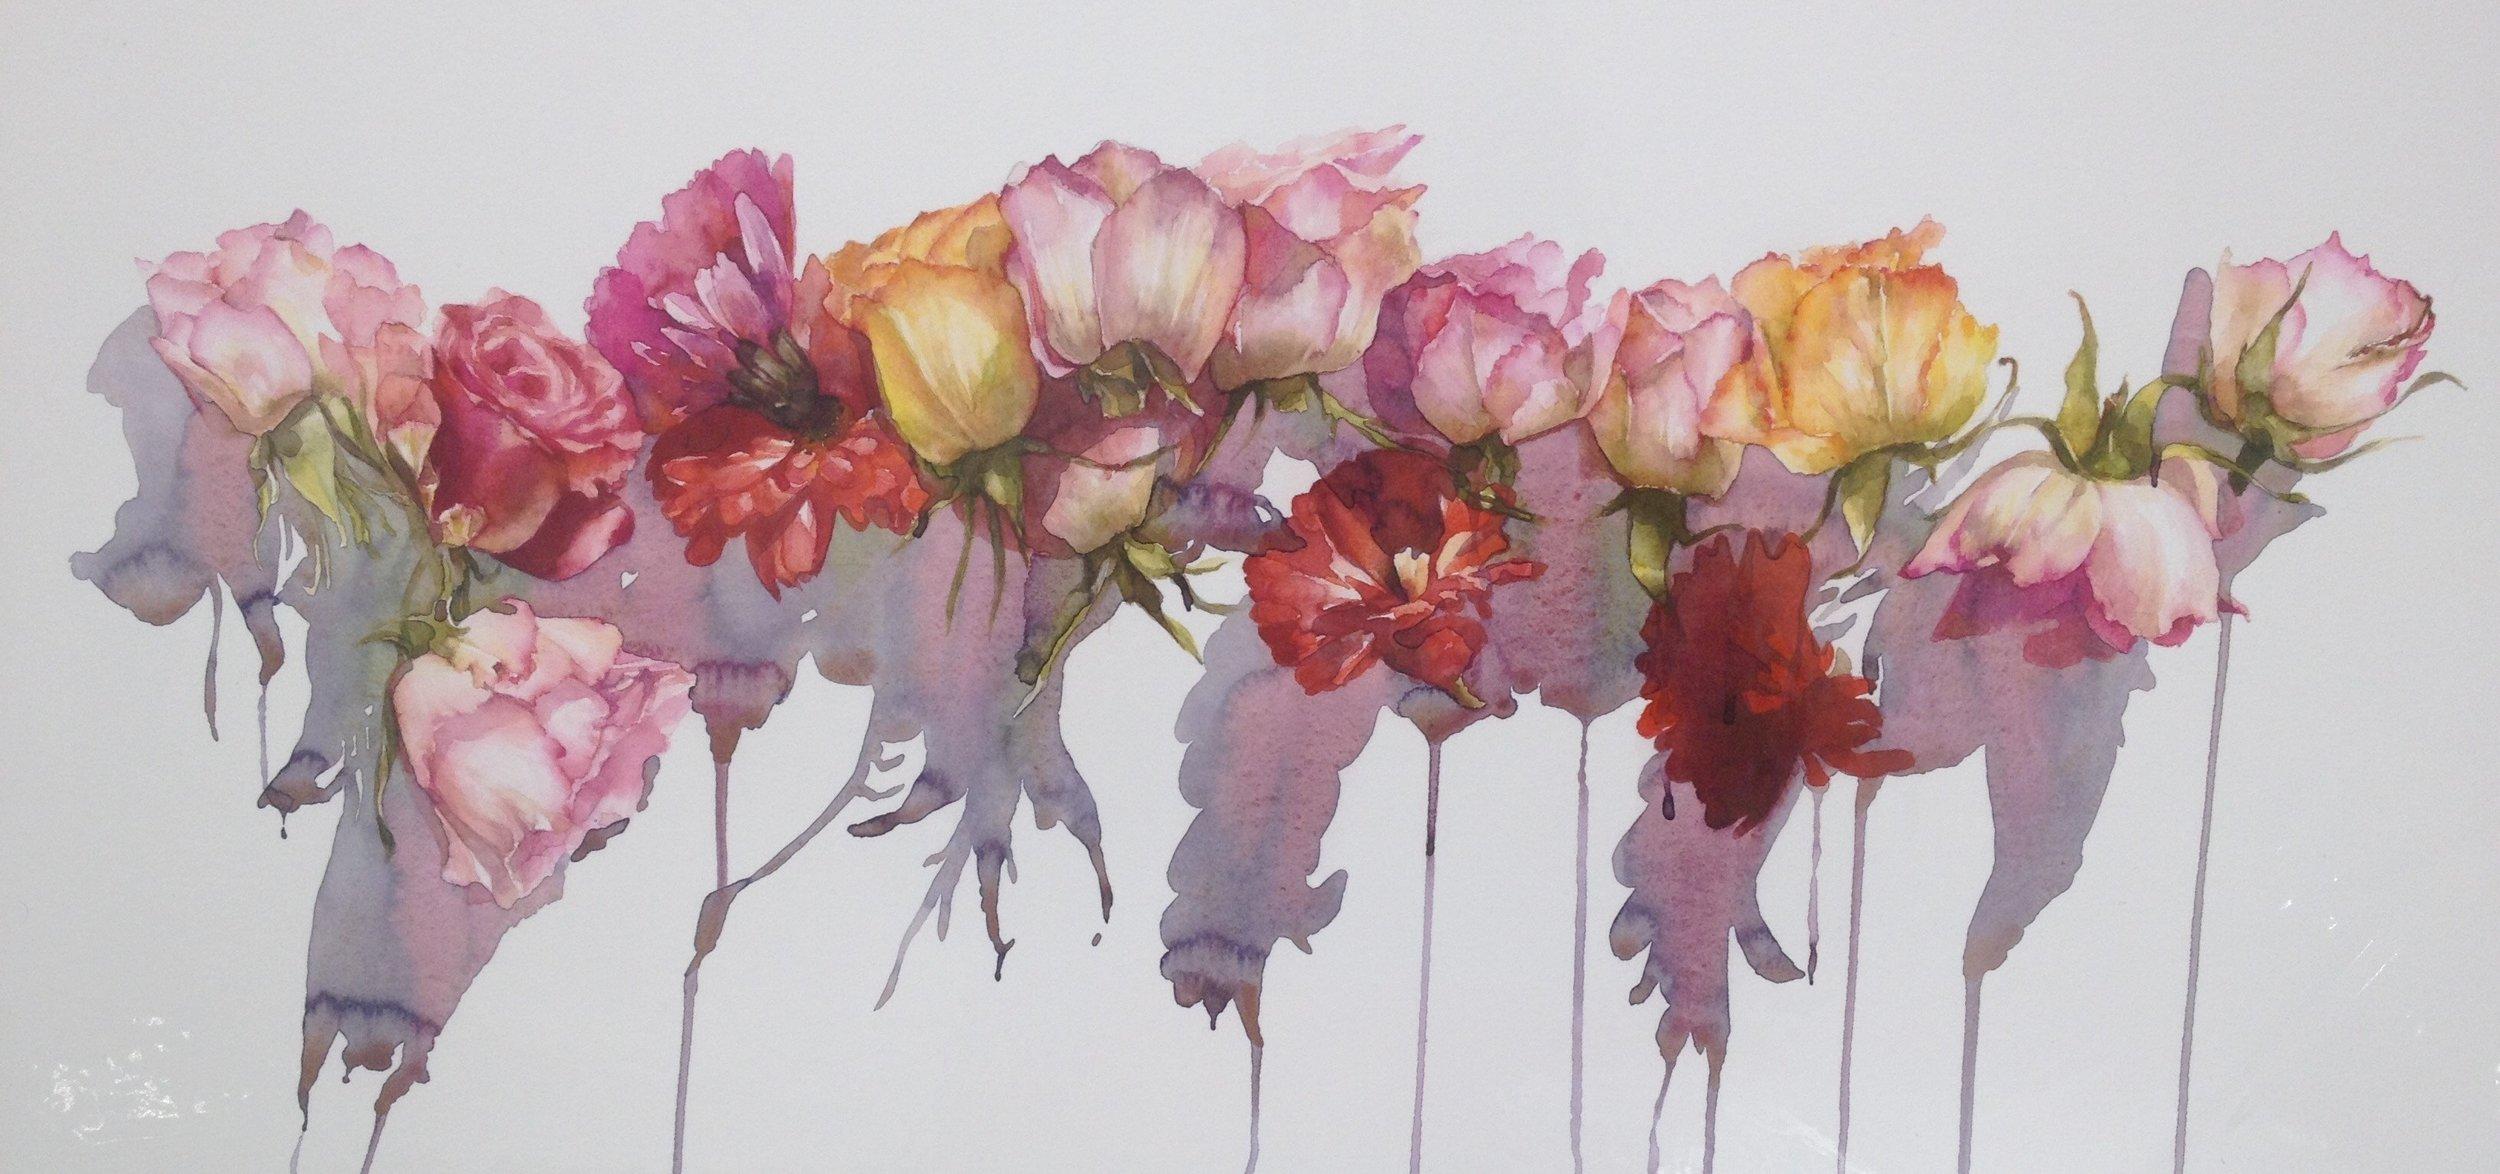 Angela Malone, Garland, Watercolour, 41cm x 104cm,  http://Www.angelamaloneart.com